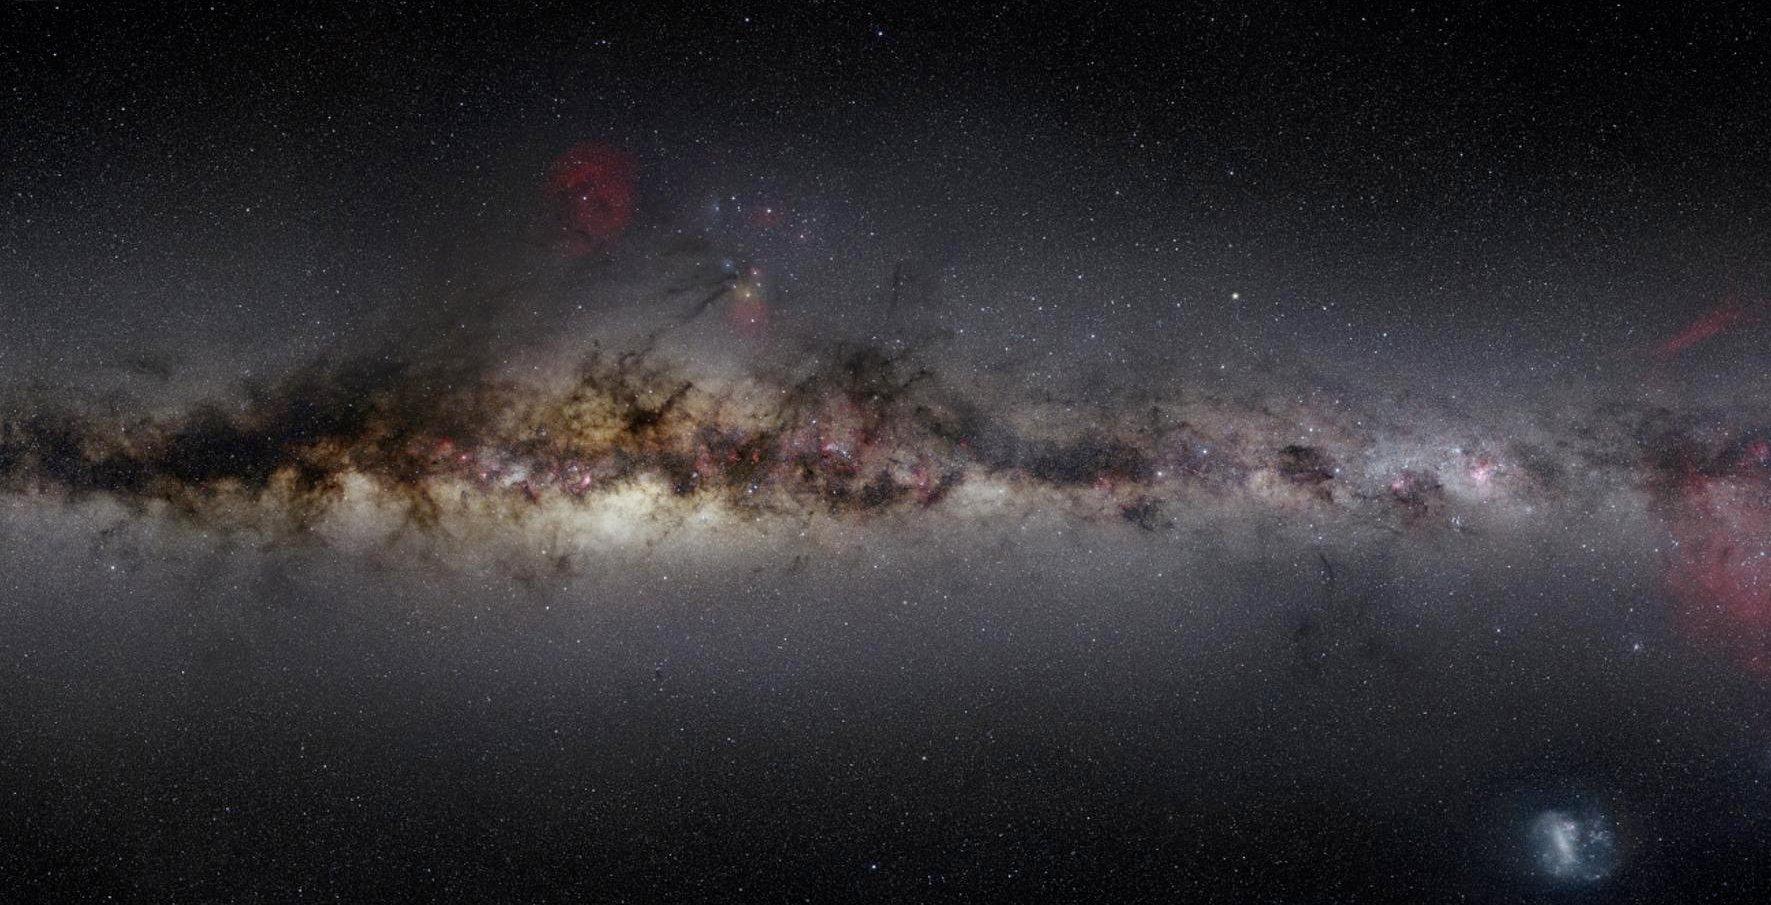 Gleamoscope/Nick Risinger/skysurvey.org